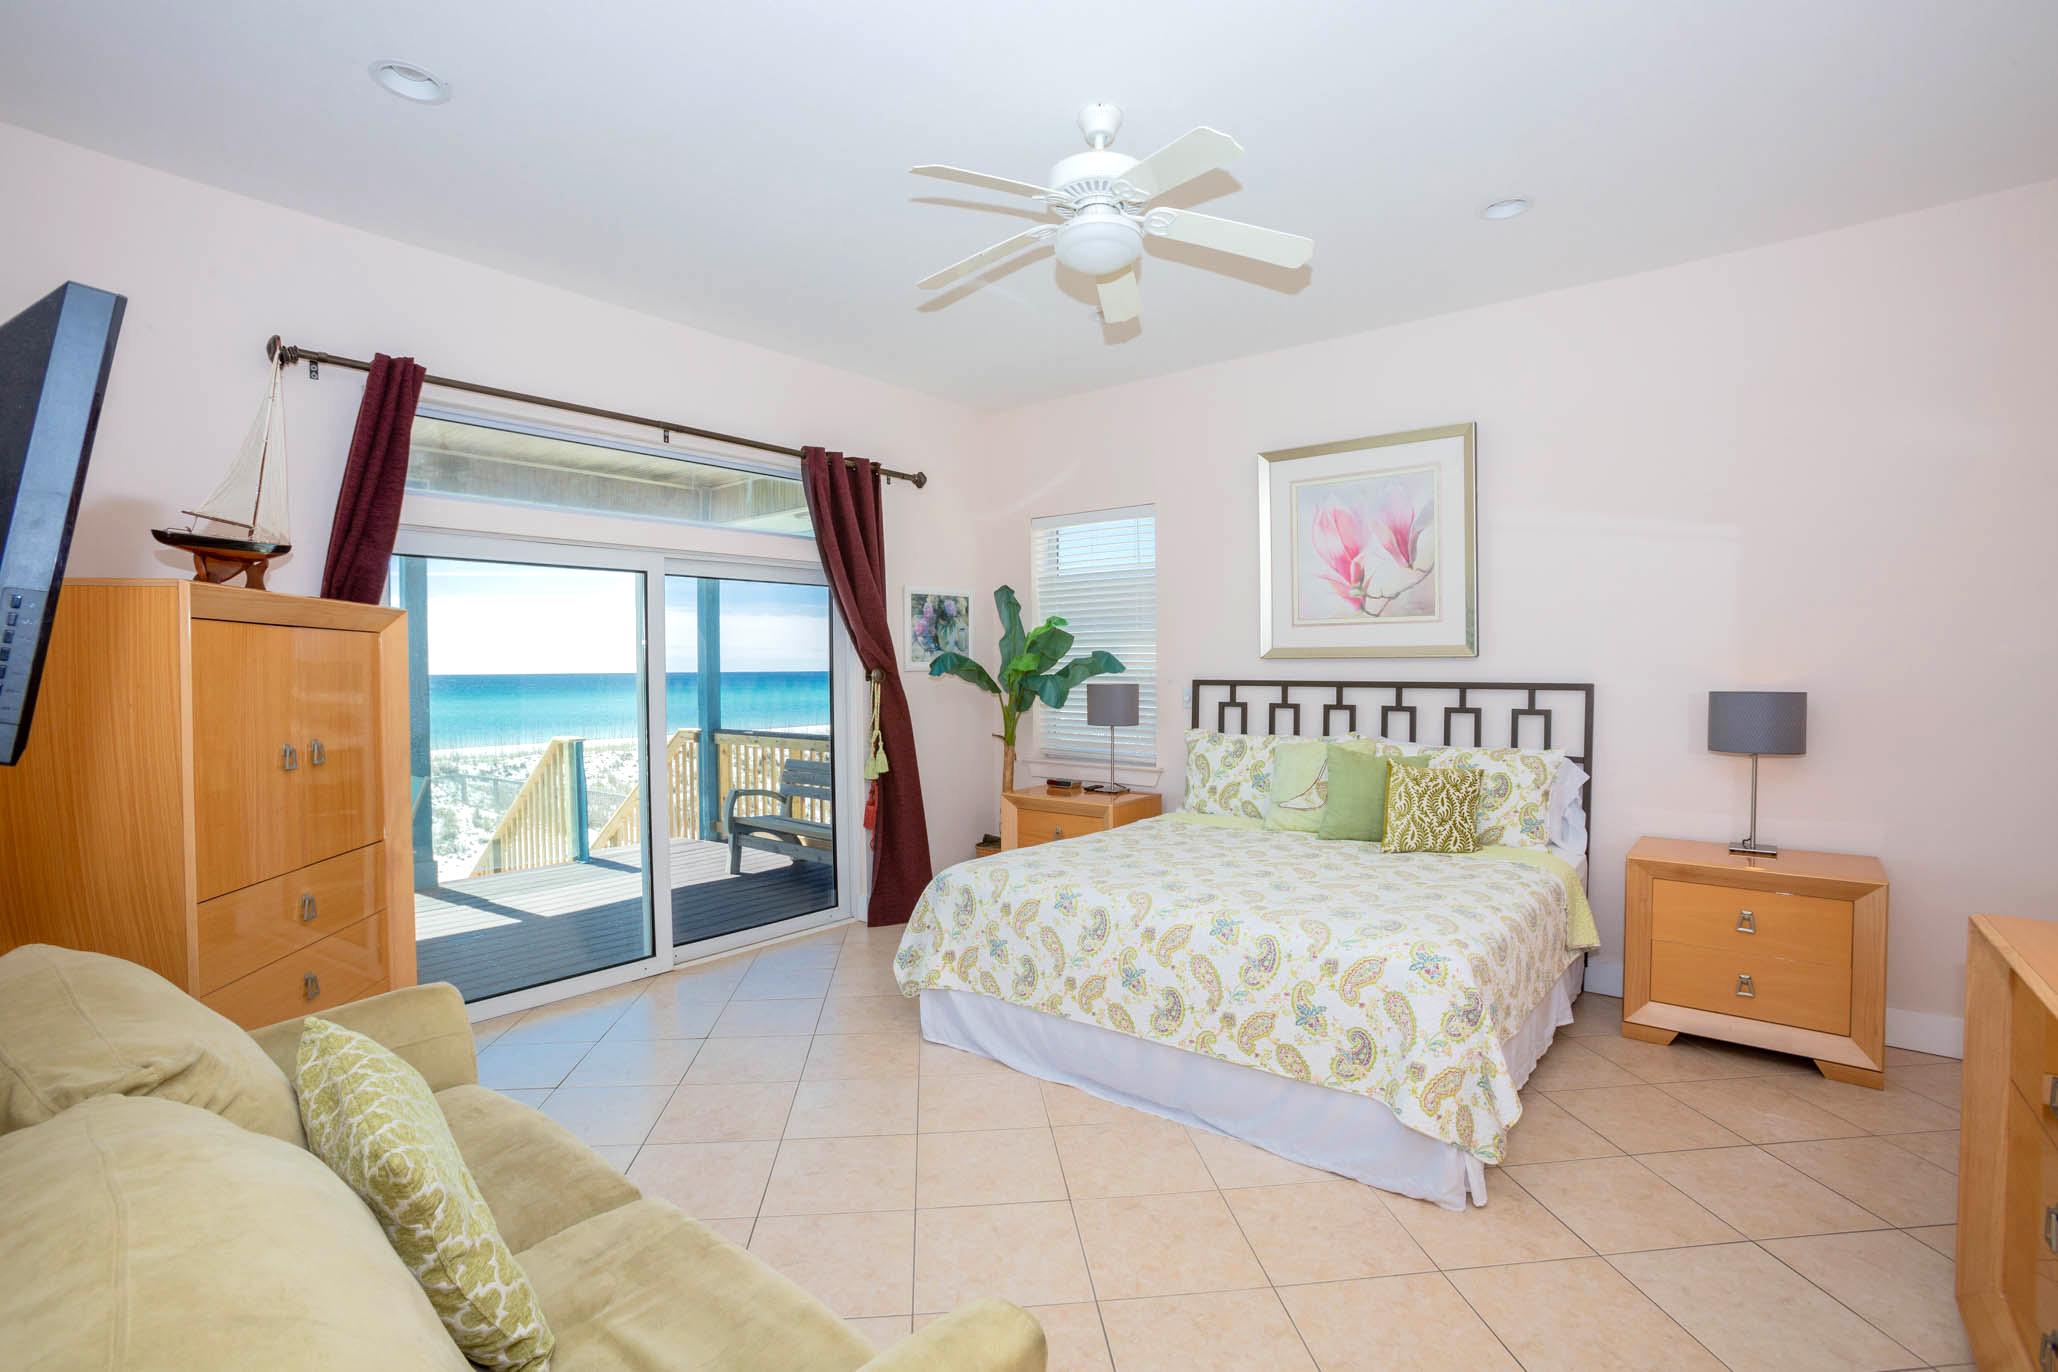 Ariola 1214 House/Cottage rental in Luxury Homes in Pensacola Beach Florida - #26